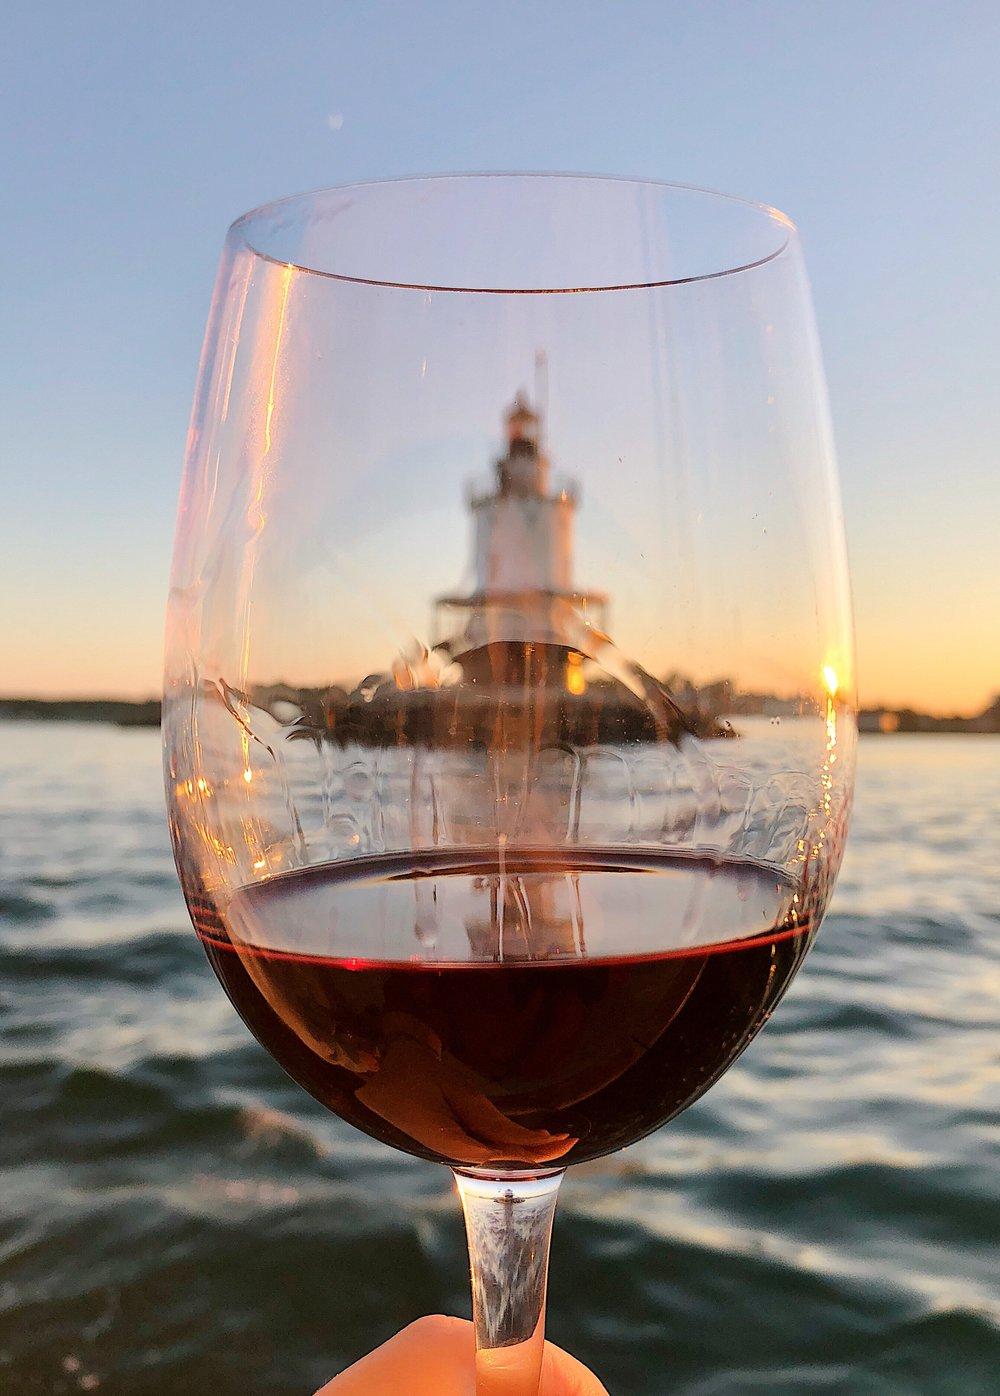 wine_wise_events_portland_maine_wine_sailwine_wise_events_portland_maine_wine_sail9A9B1A2A-AB6C-489C-A307-779D6223DAC5.jpg